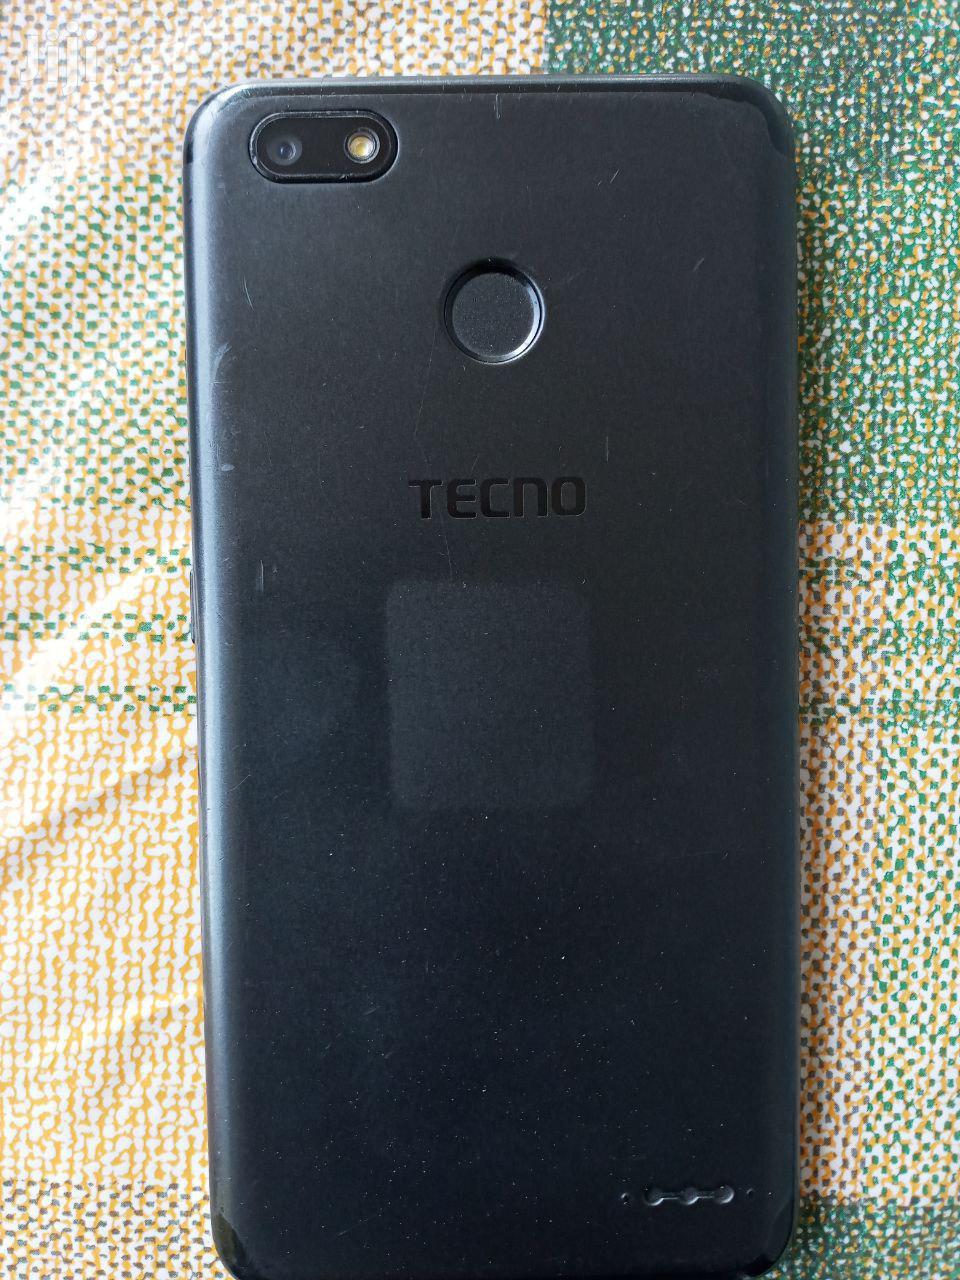 Tecno Spark K7 16 GB Black | Mobile Phones for sale in Kirkos, Addis Ababa, Ethiopia